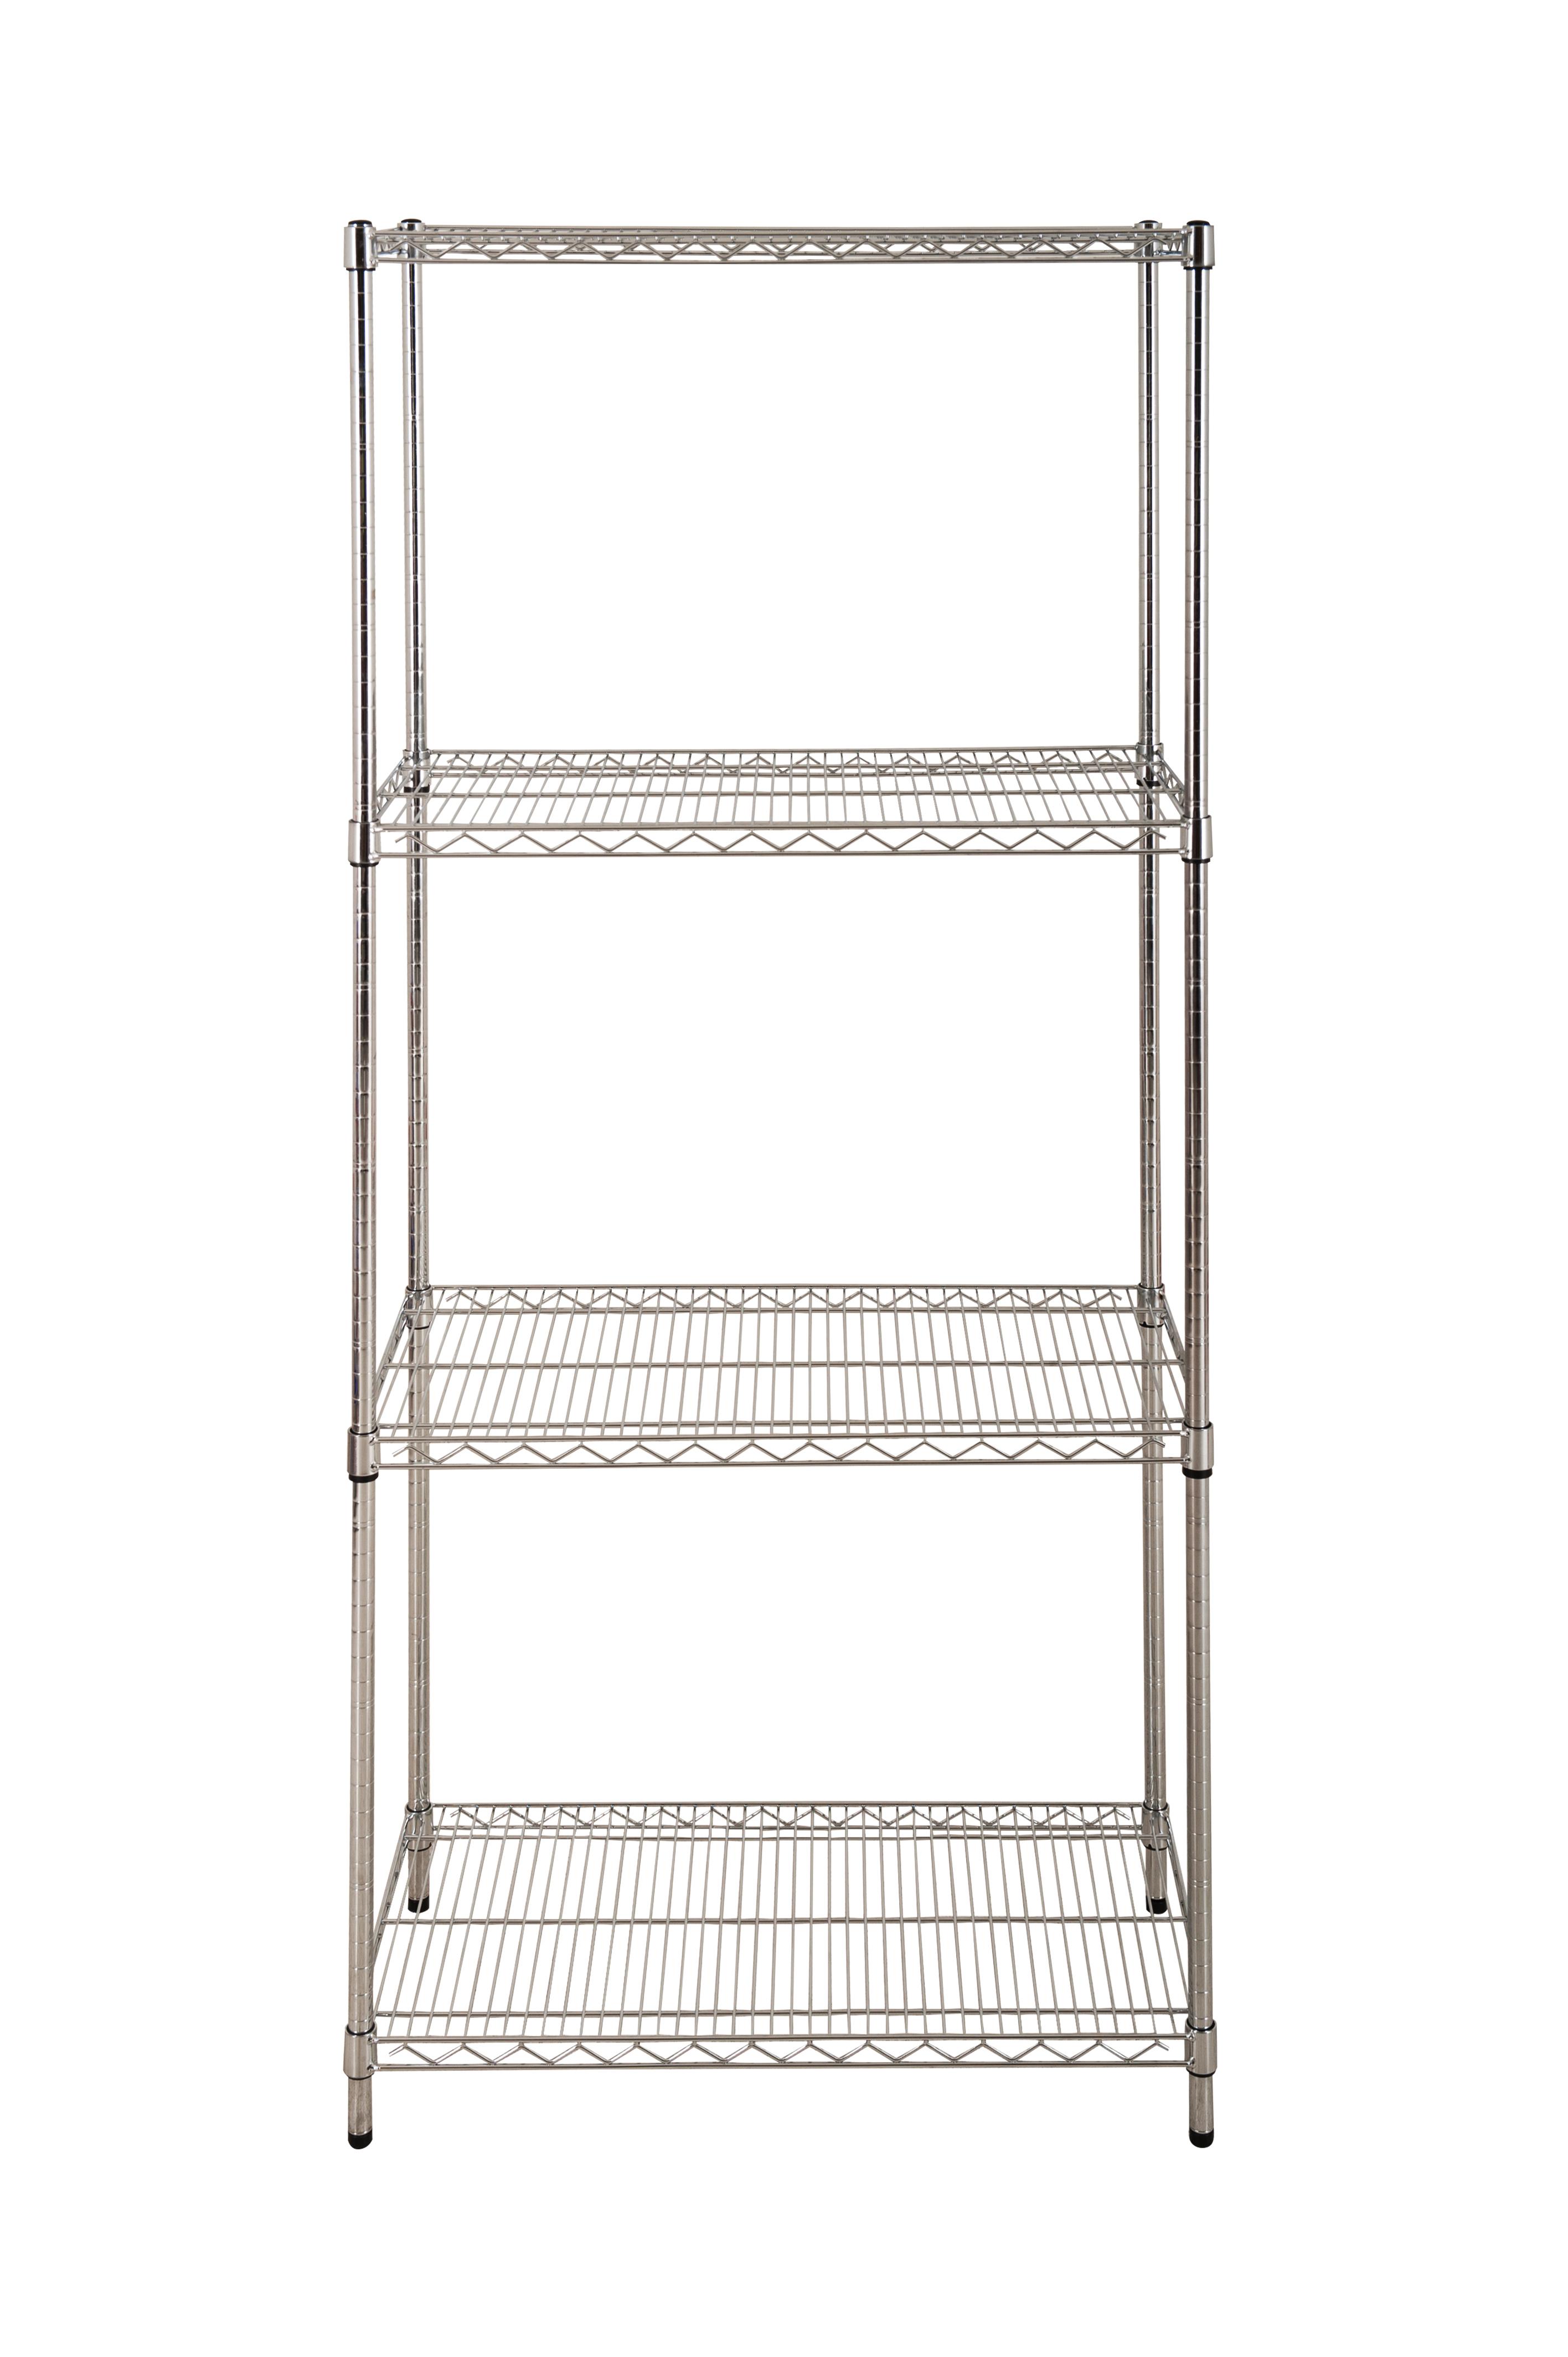 4 Shelf Chrome Starter Bay - 1600 x 1220 x 355